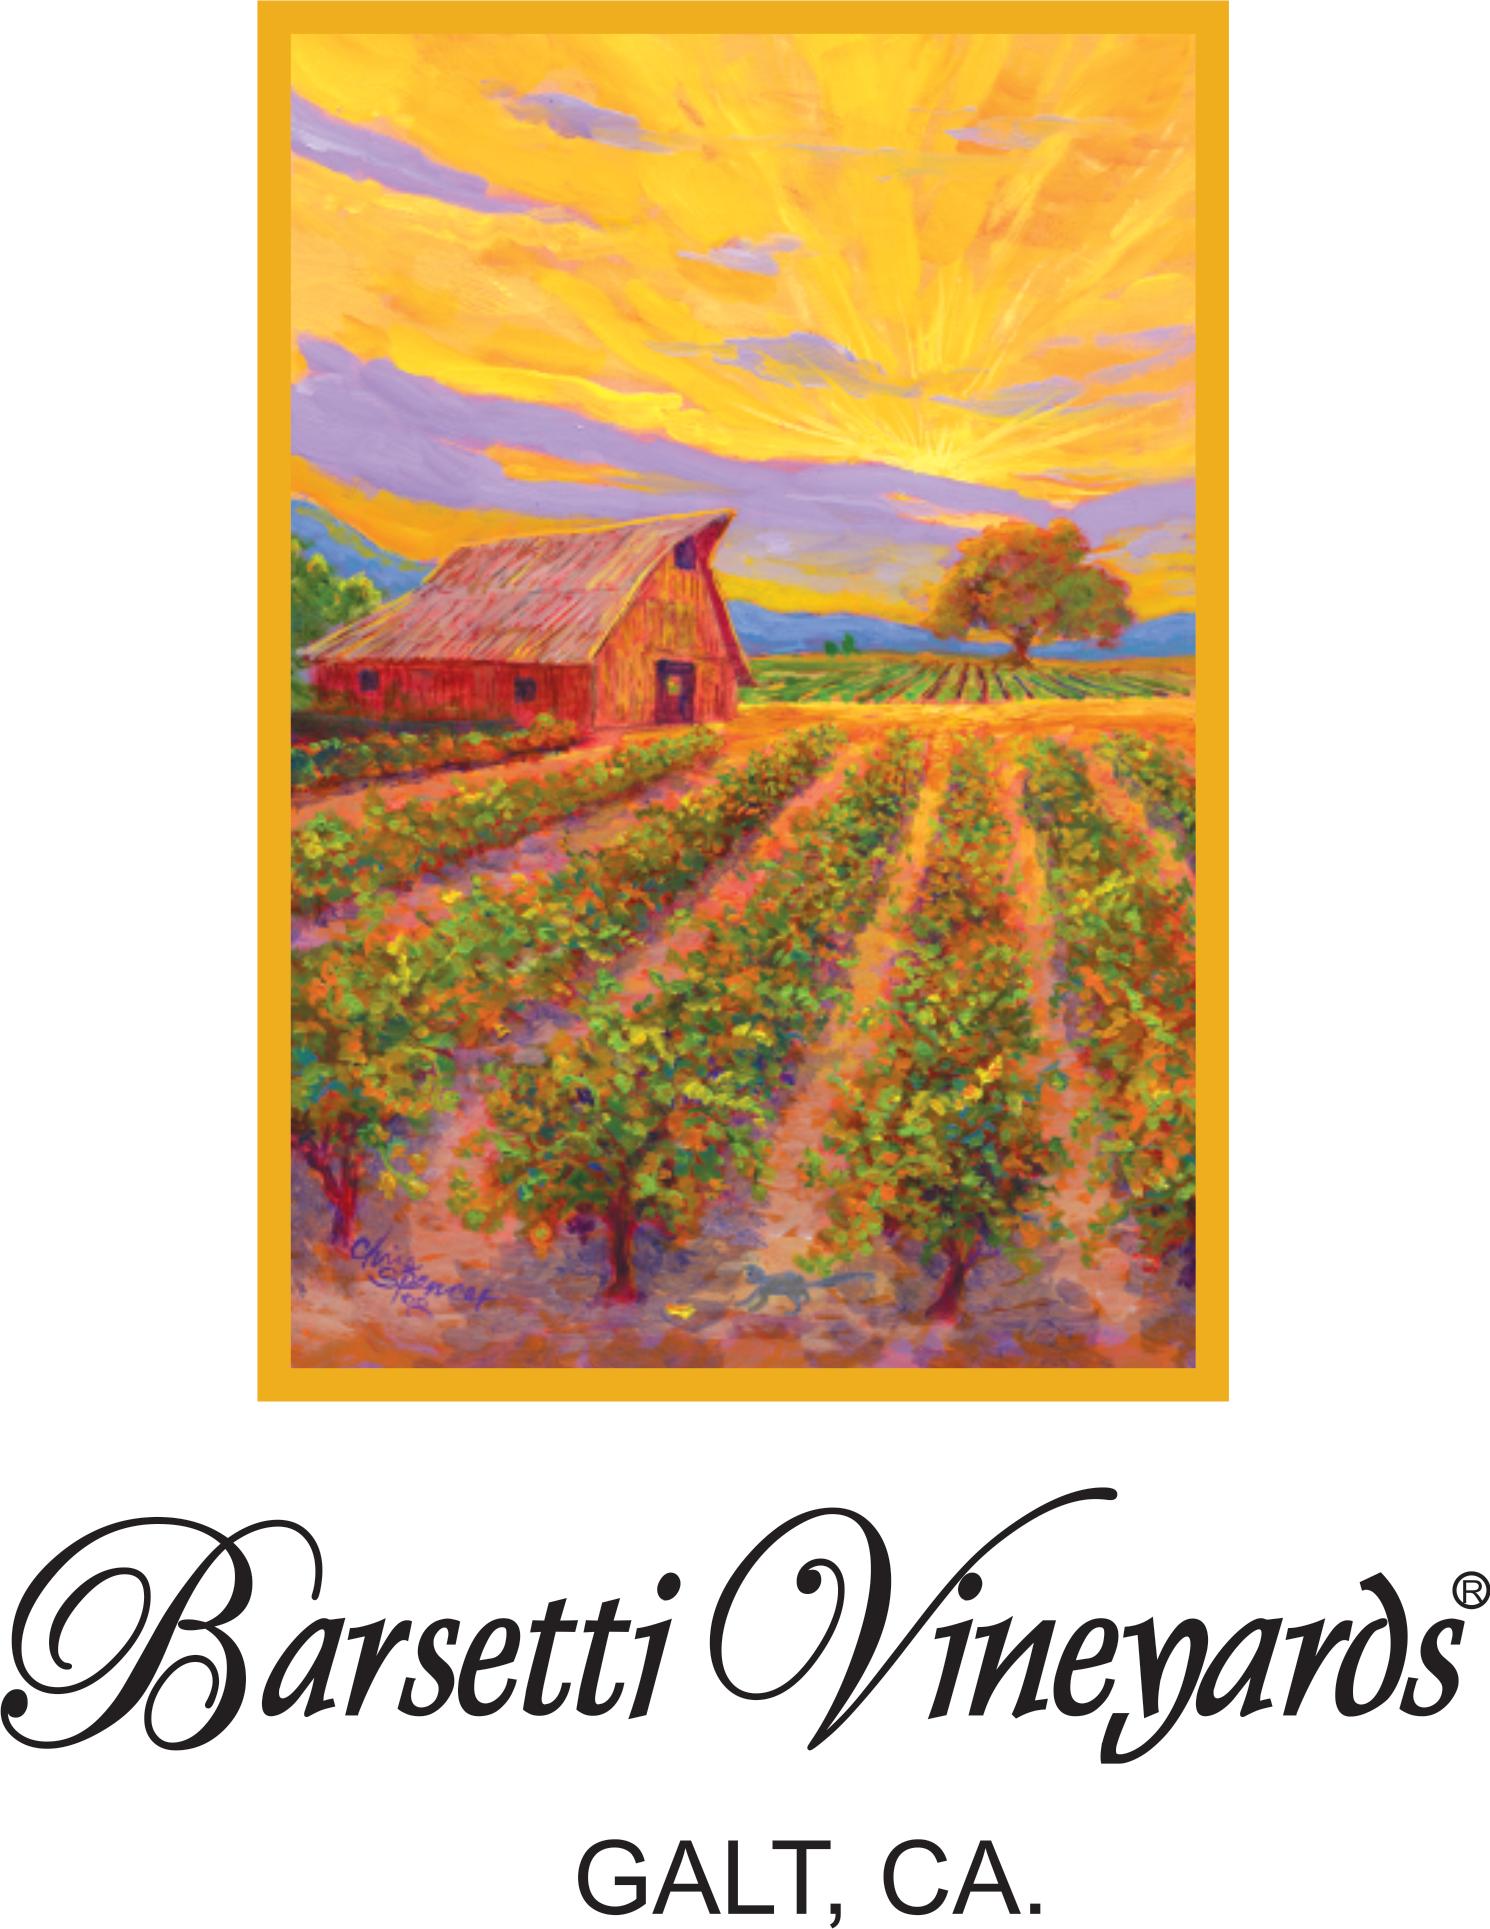 Barsetti Vineyards, Galt, CA logo